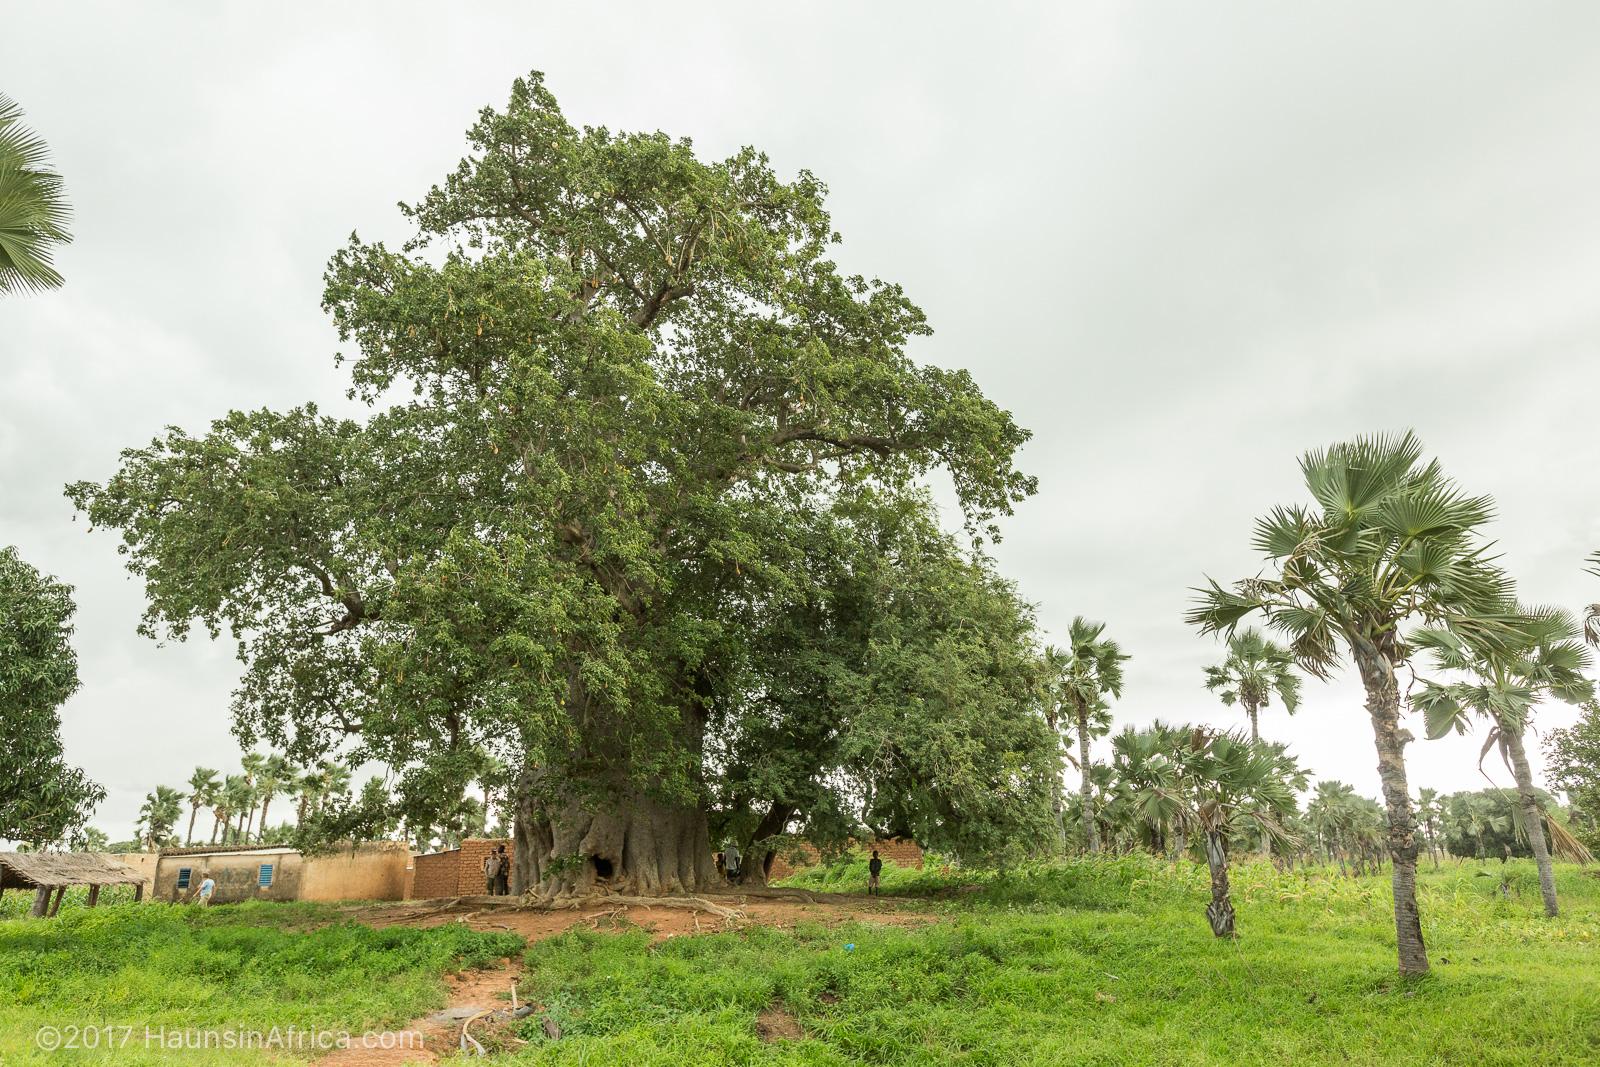 idesign nhung cay baobab dang chet 03